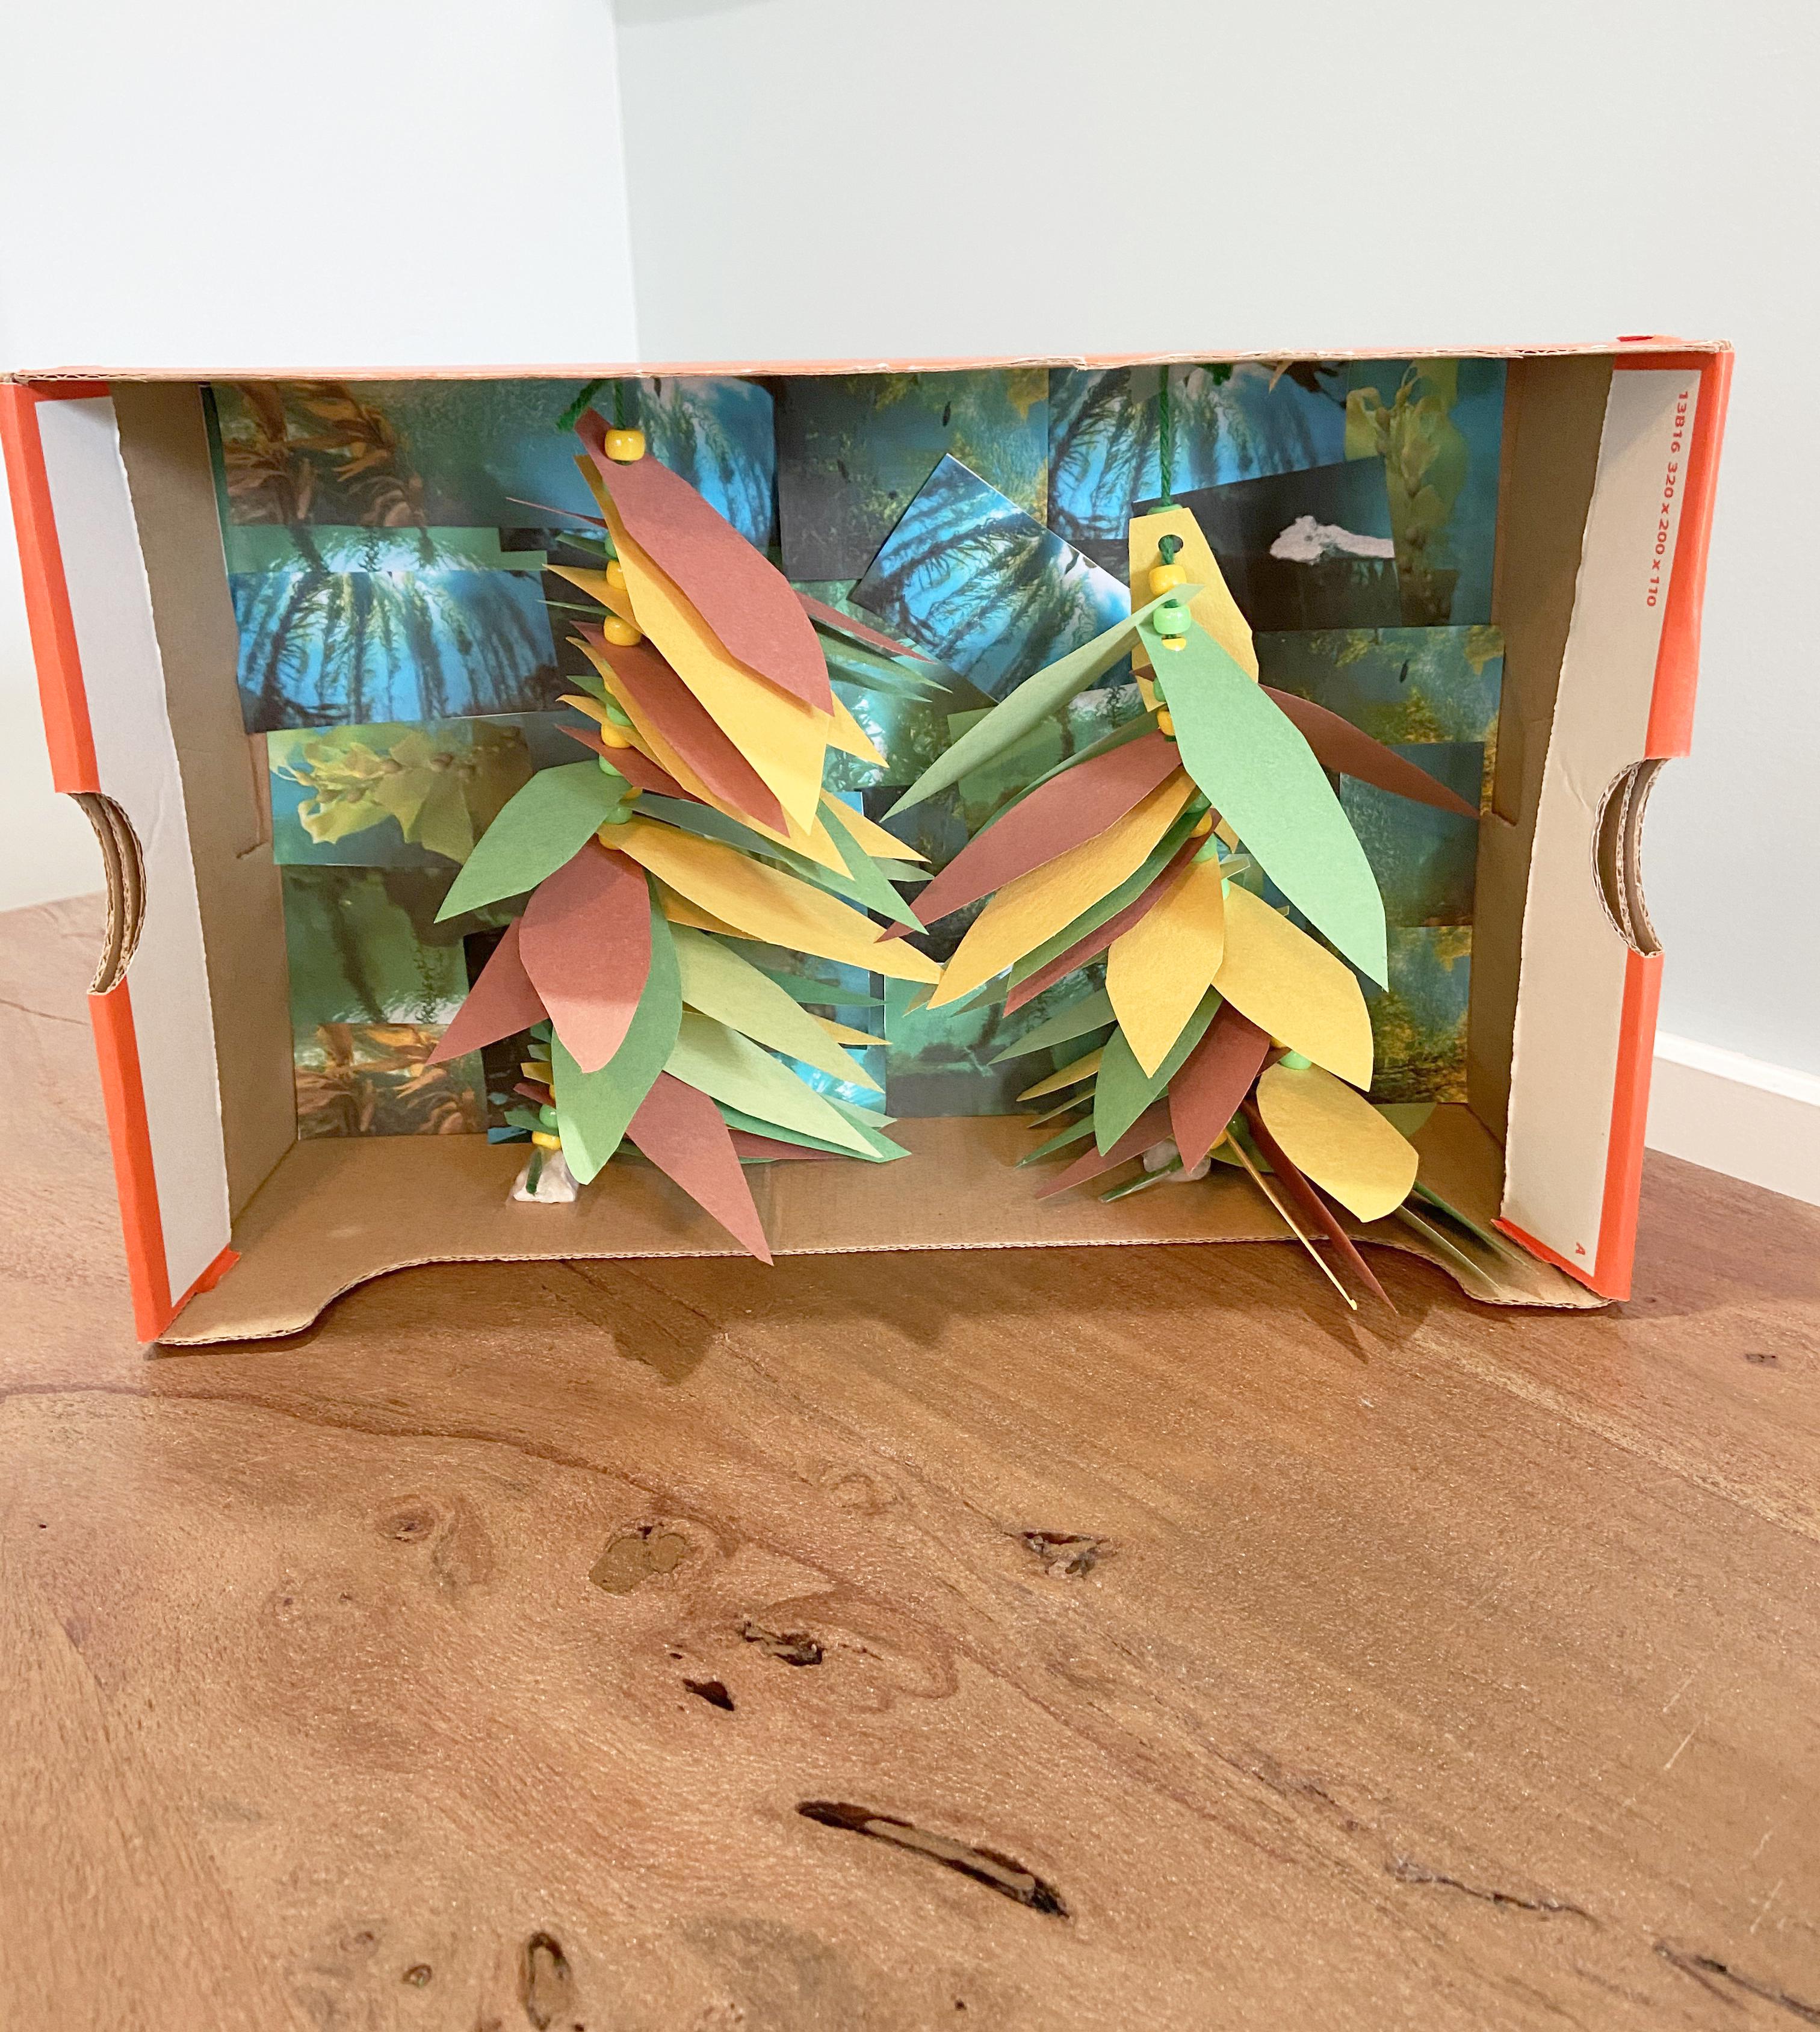 Kelp forest craft for kids - hang kelp